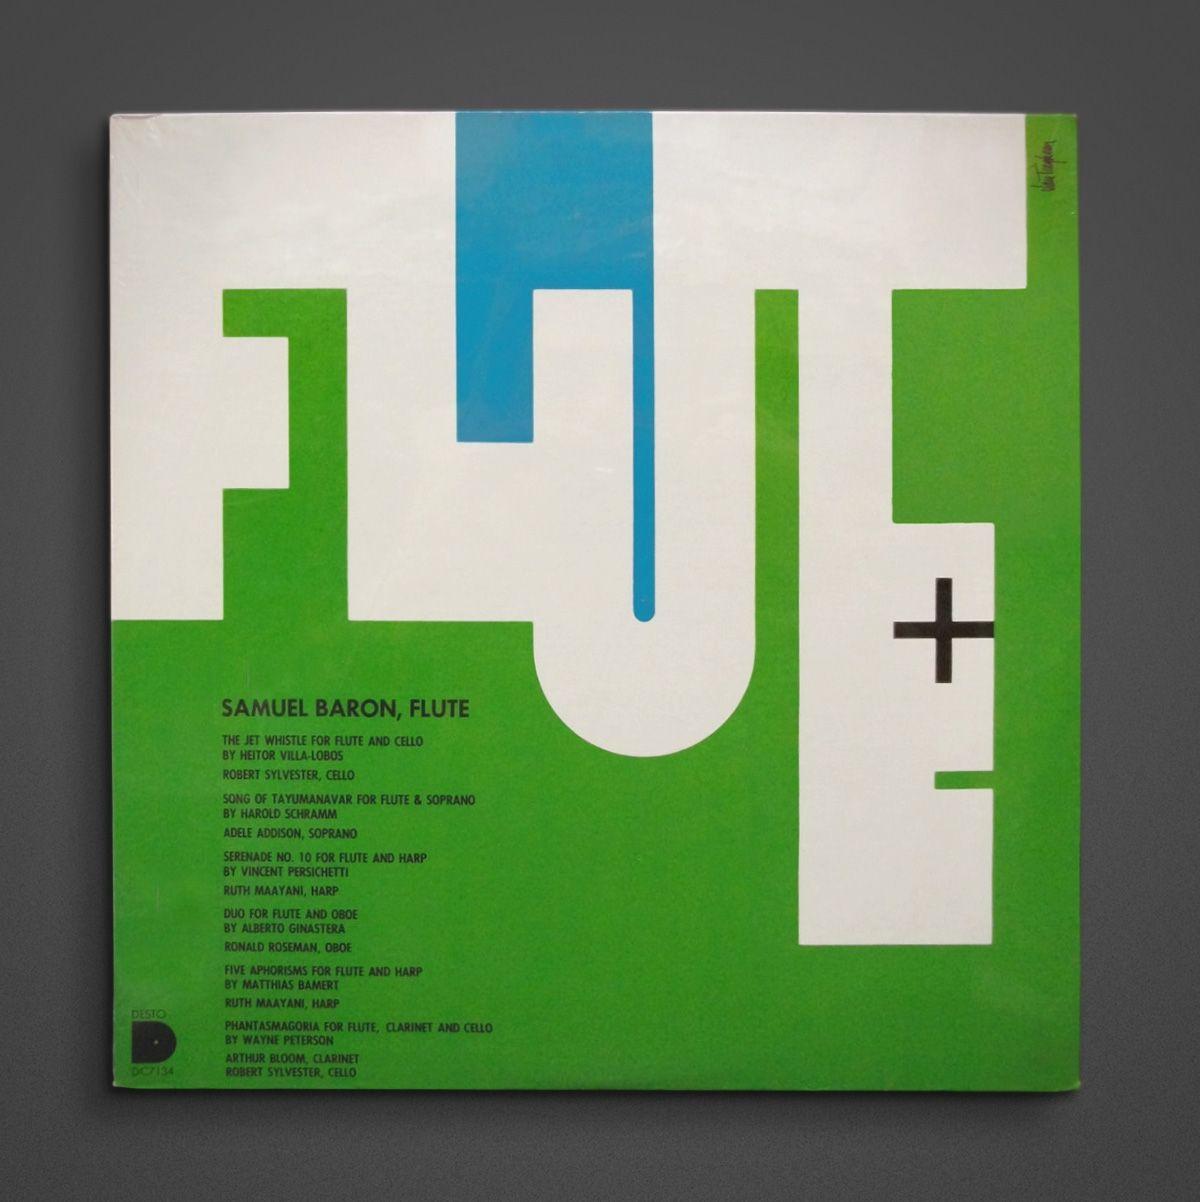 Album Cover 1972 Cover Design By Richard F Van Tieghem